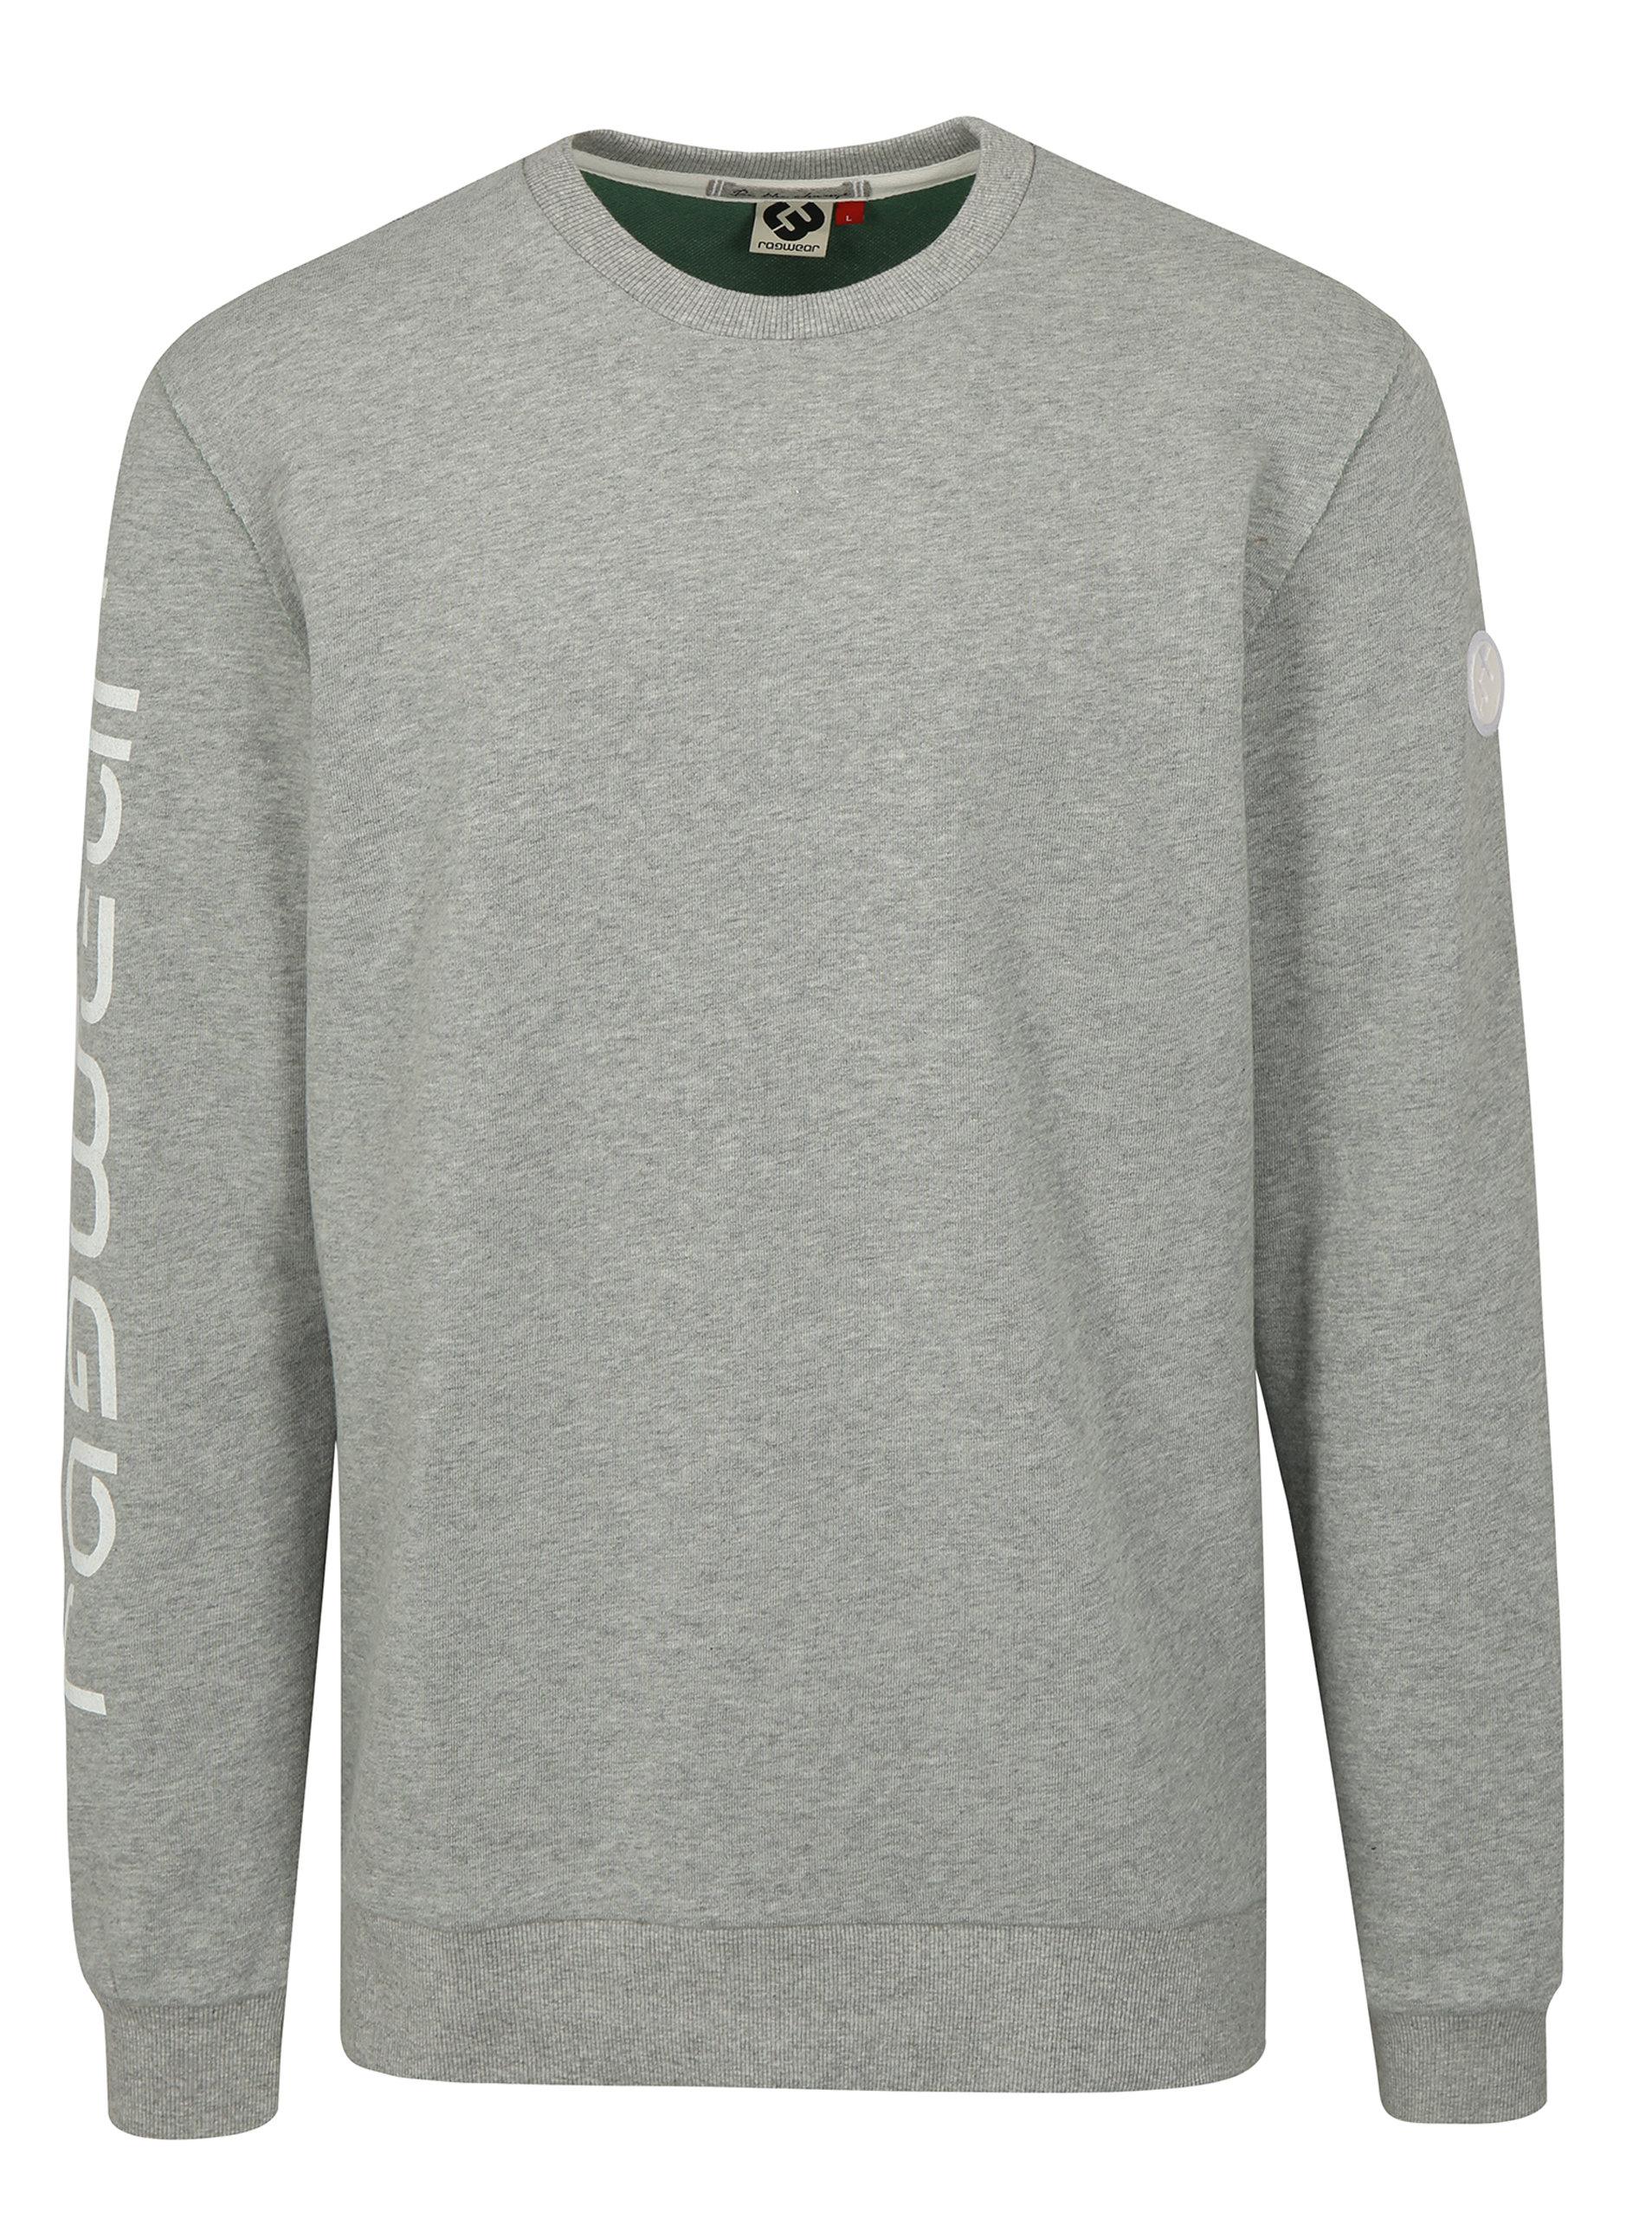 adfbfb46e6e Světle šedá pánská mikina Ragwear Indie